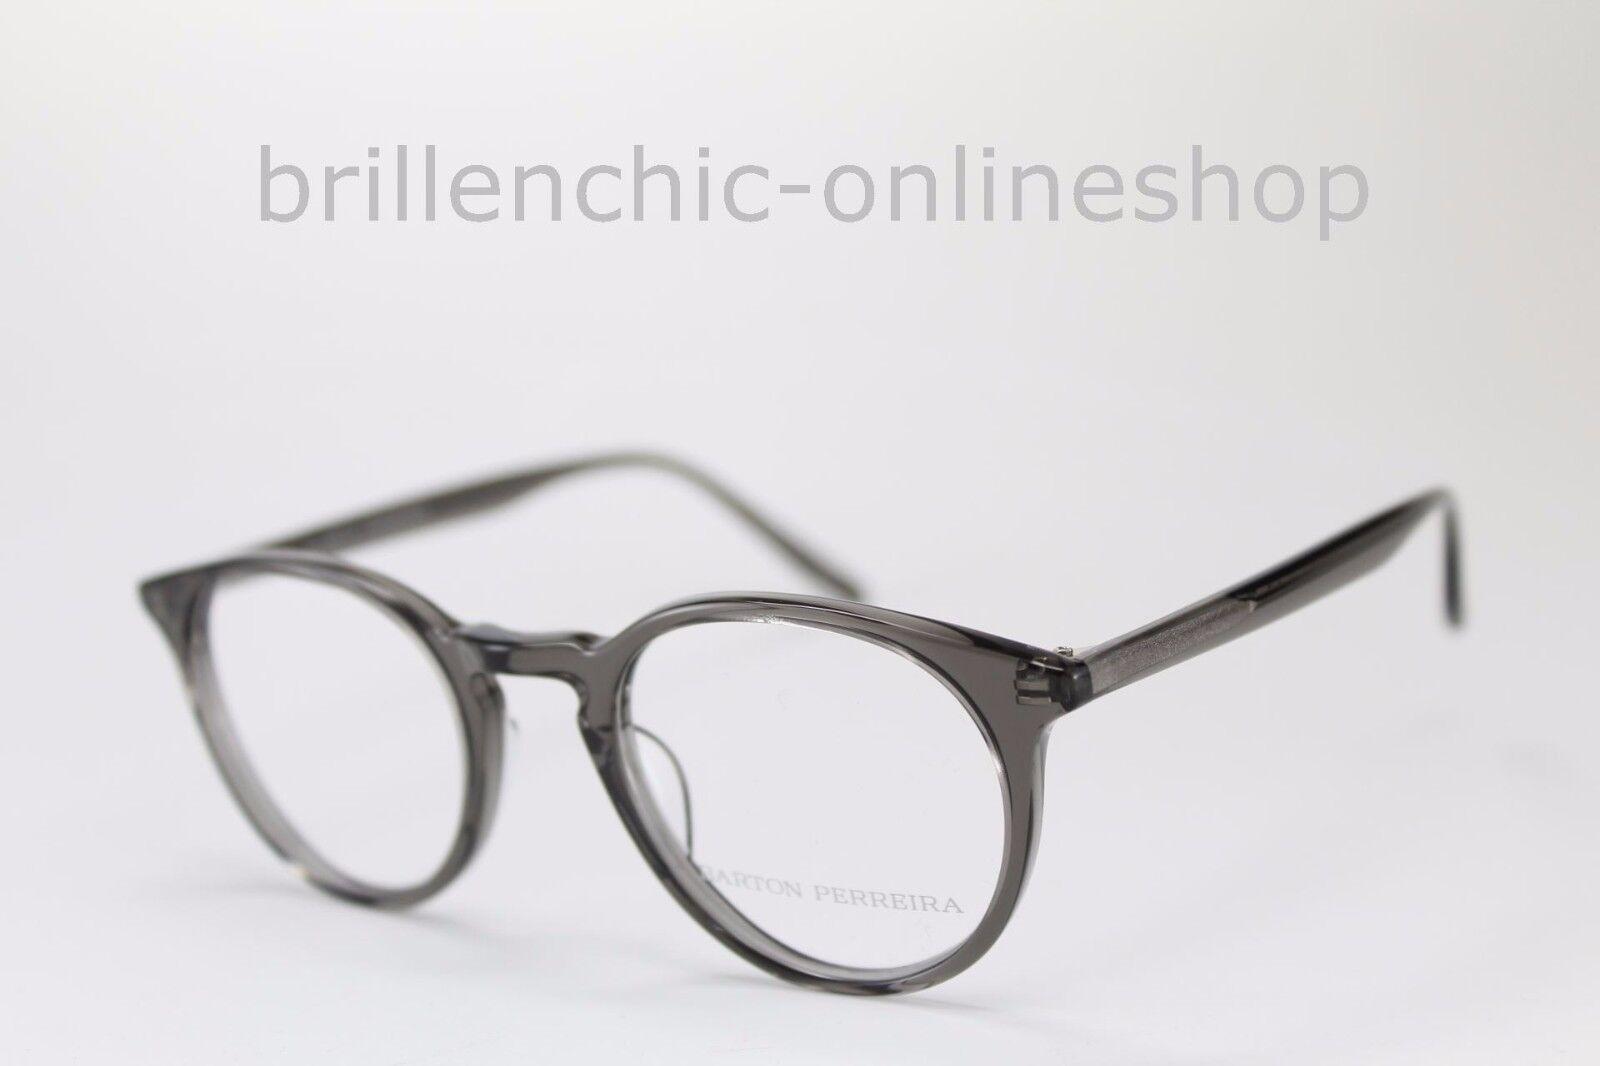 BARTON PERREIRA Brille PRINCETON PRINCETON PRINCETON col. dusk Gr. 46 22   NEU   | Das hochwertigste Material  | Neuankömmling  | Gute Qualität  56fde8